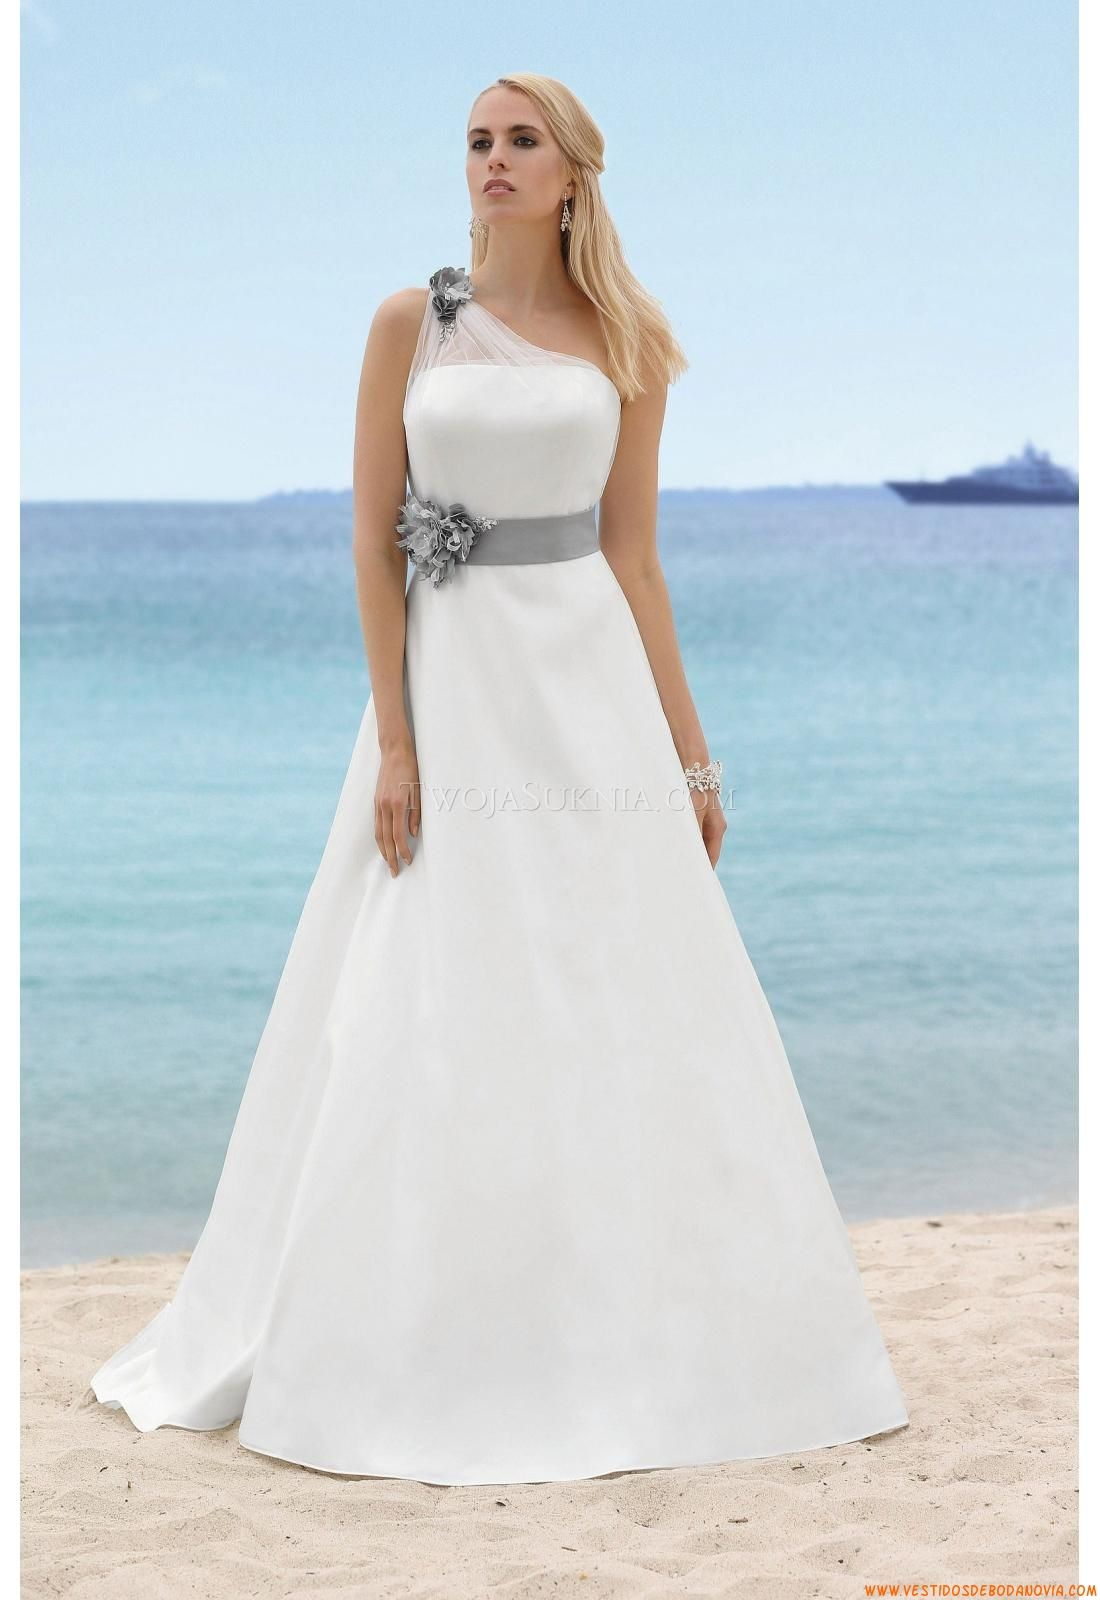 Vestido de novia Affinity Bridal Addison 2014 | yo | Pinterest ...